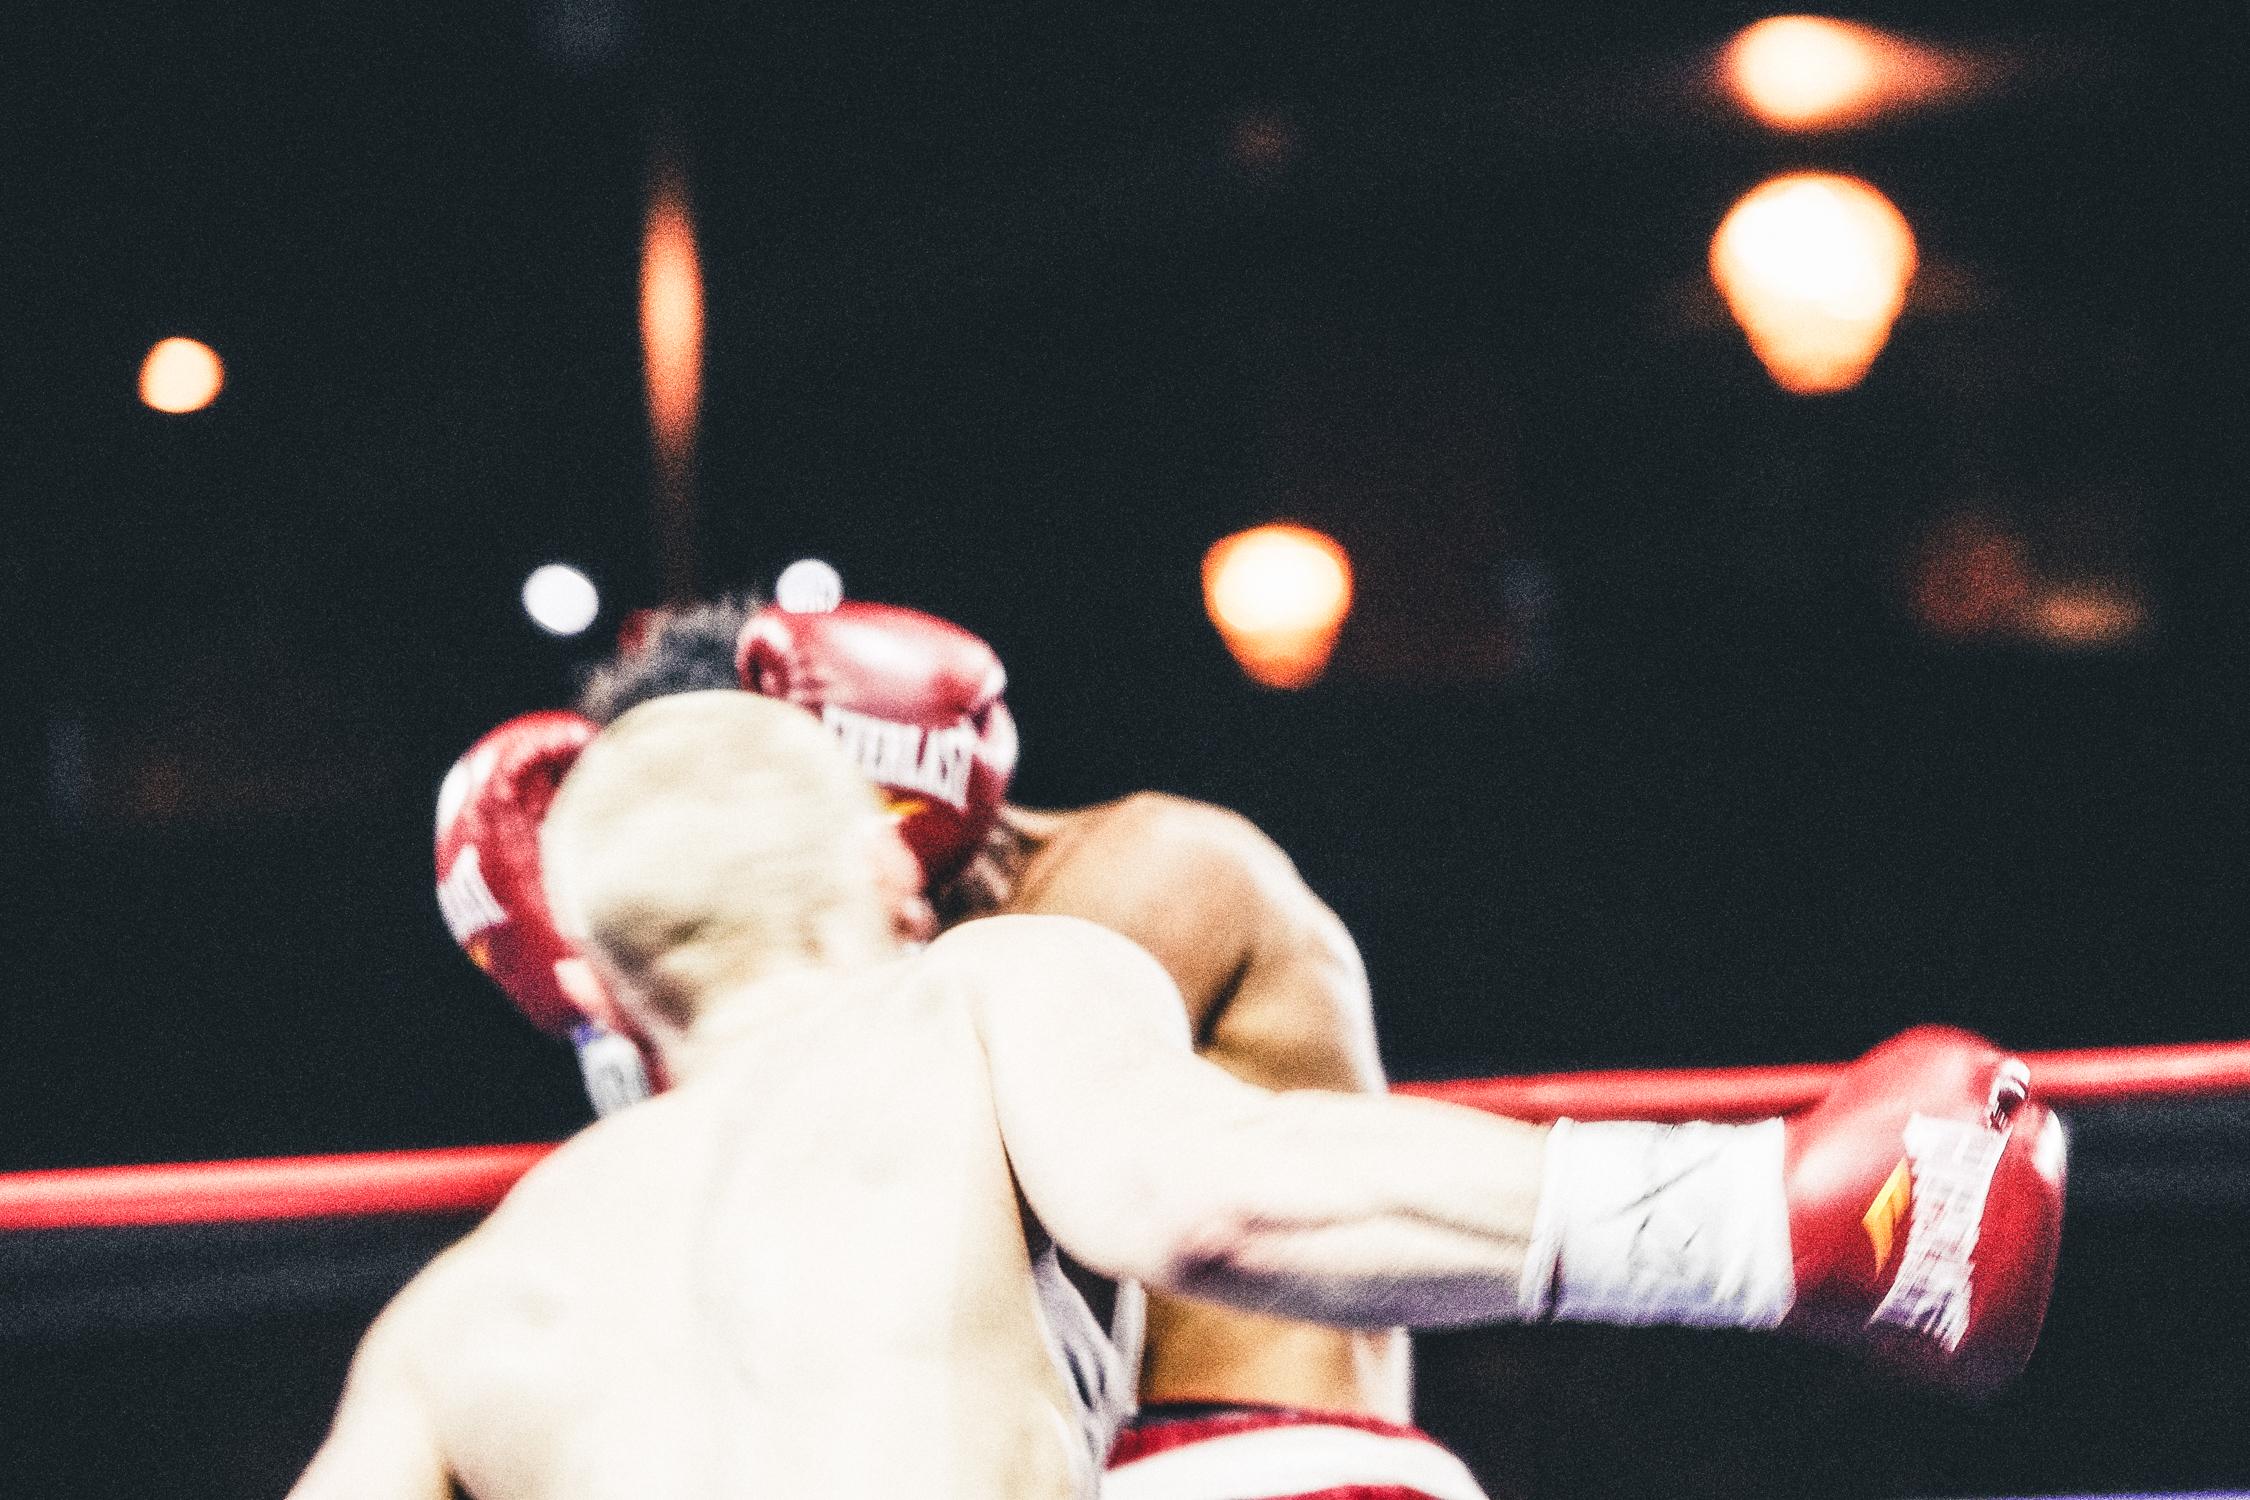 fightnight_15.jpg